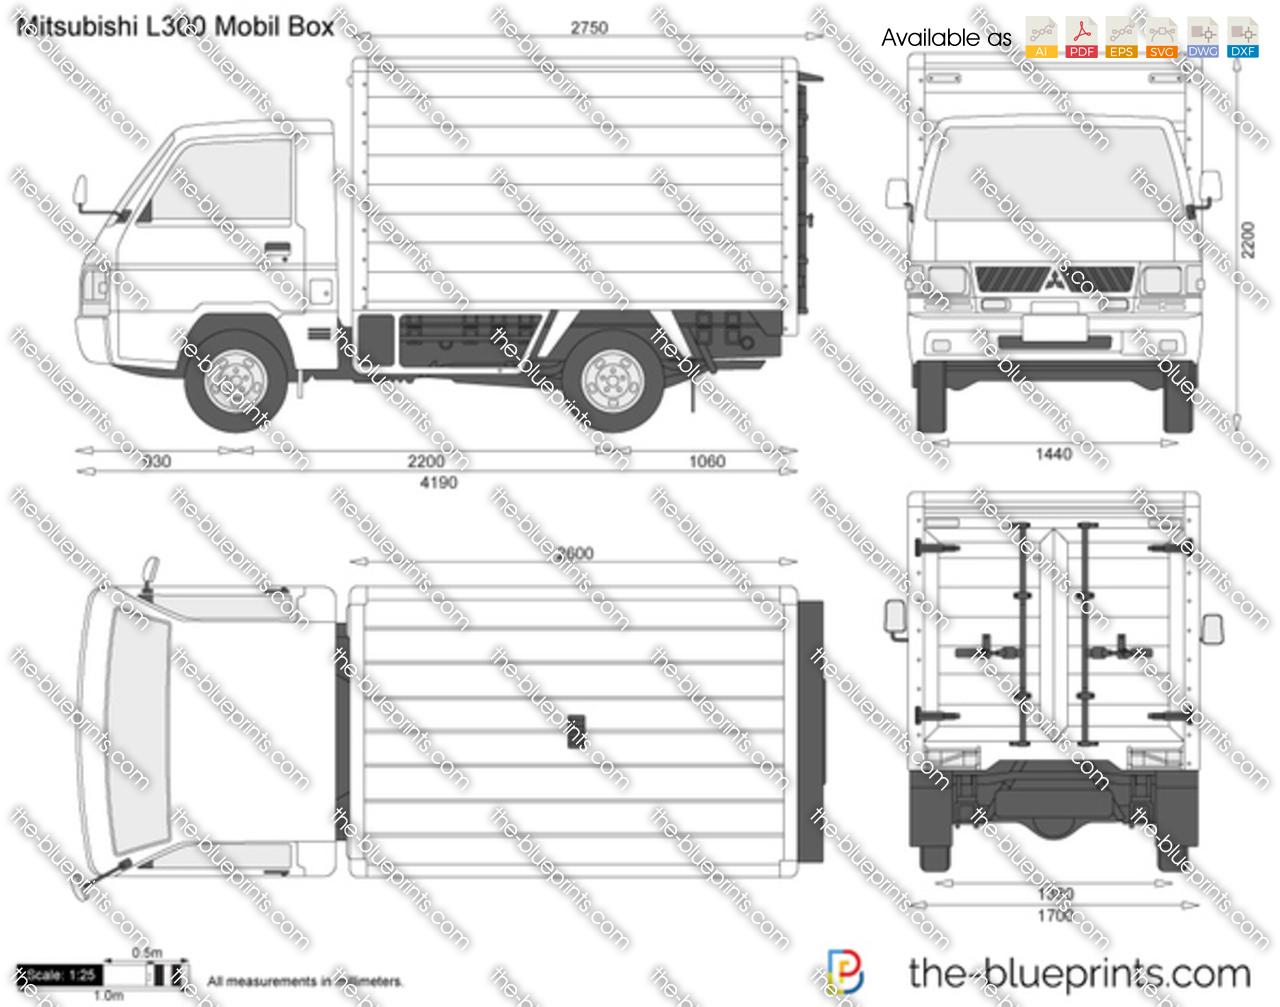 Mitsubishi L300 Mobil Box 1992